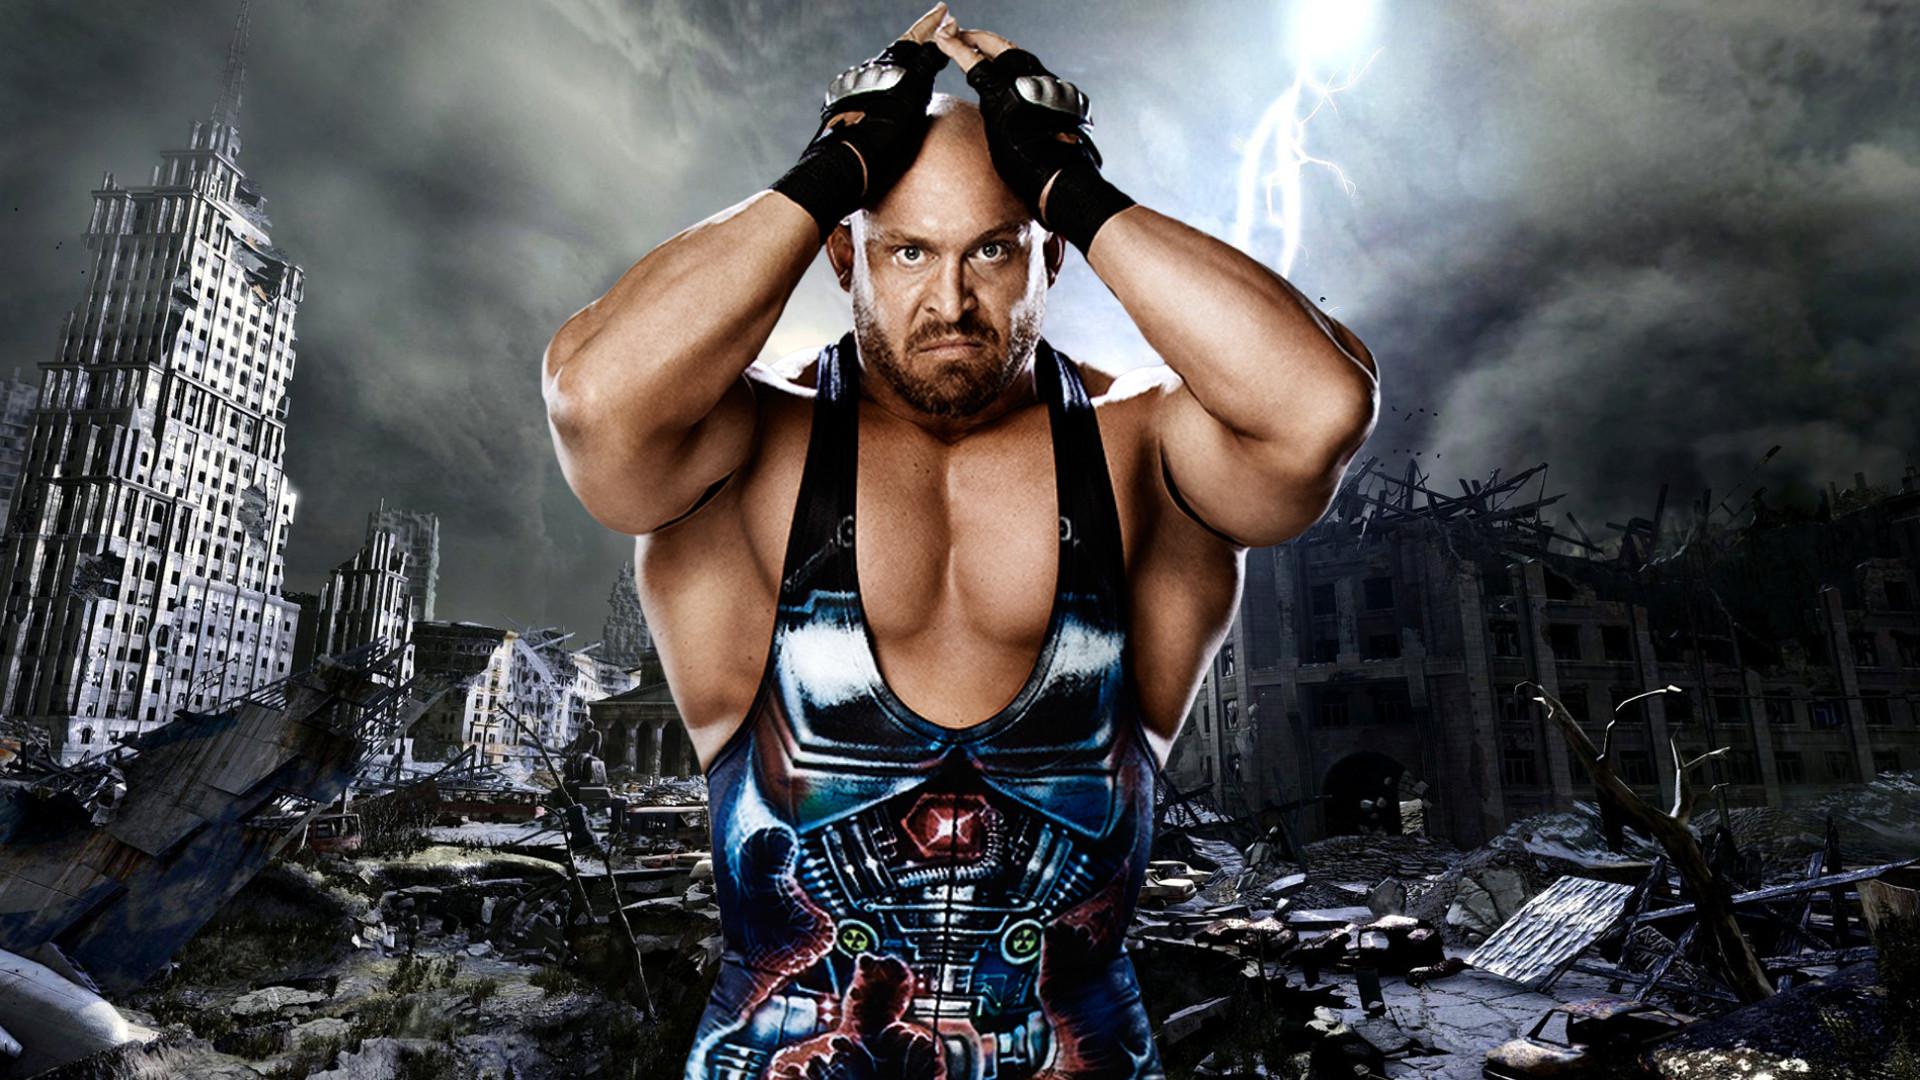 WWE TLC: Tables Ladders & Chairs 2012 HD wallpapers, Desktop wallpaper - most viewed